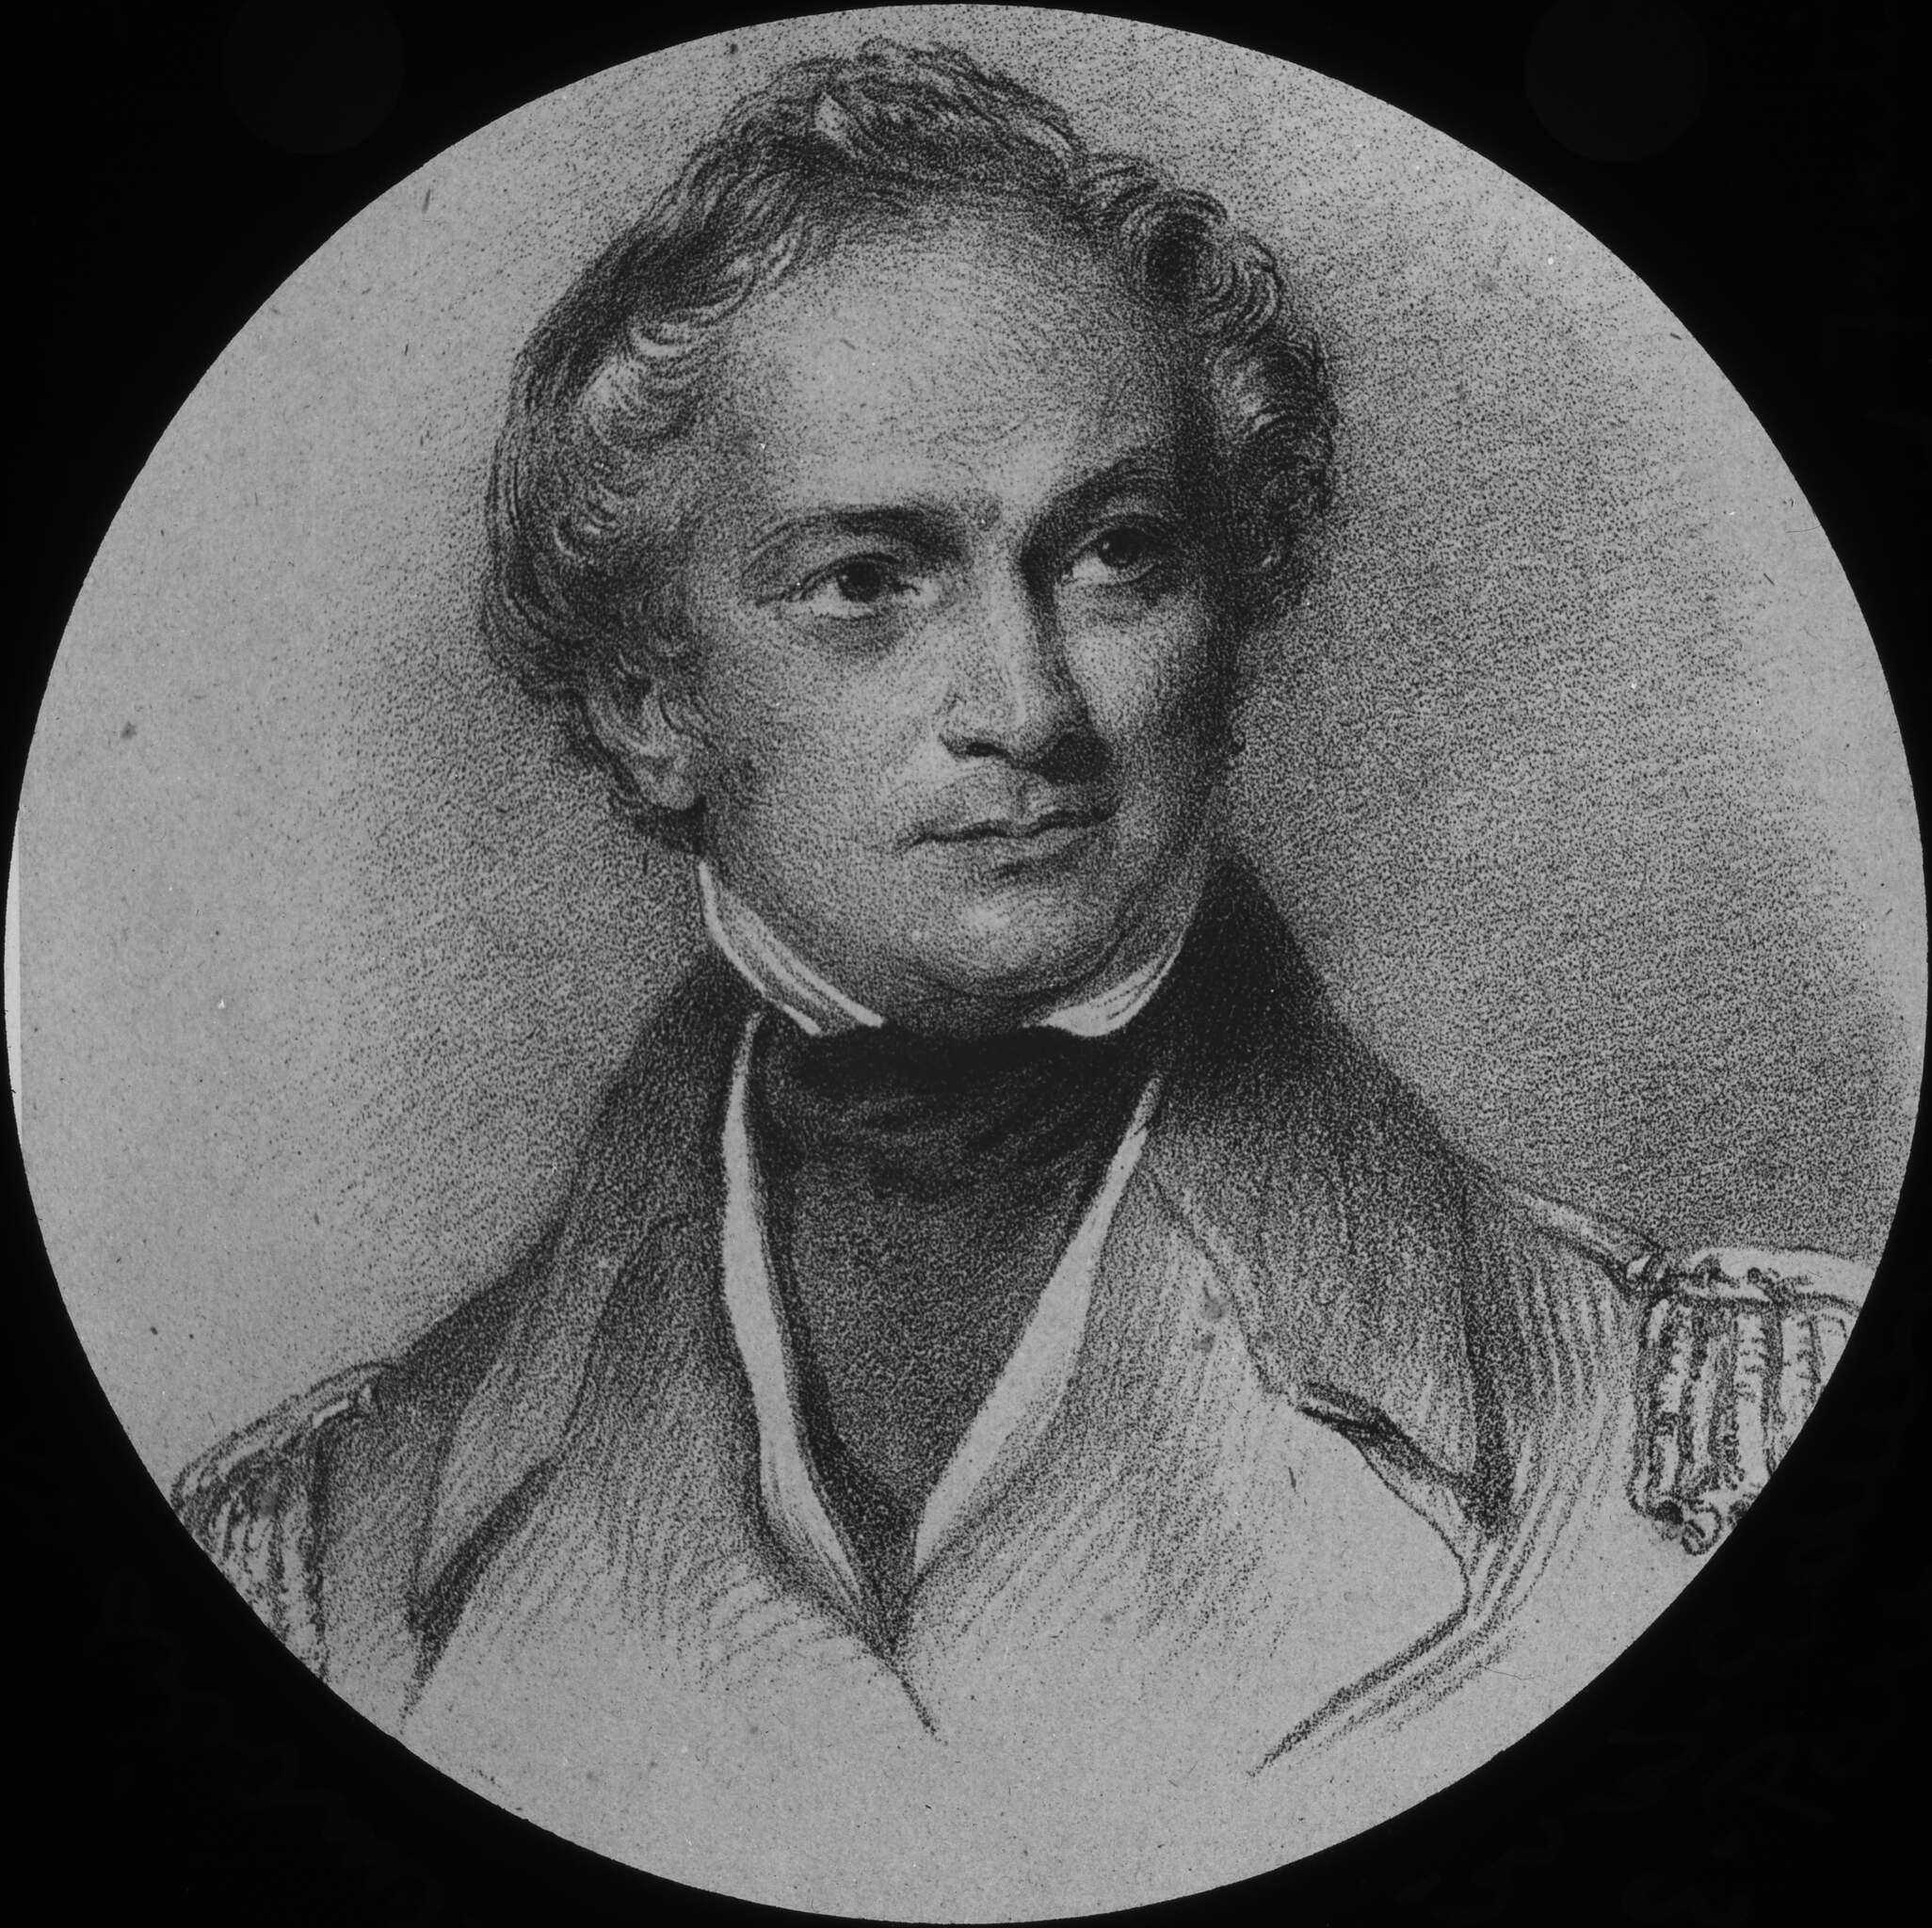 W.E. Parry